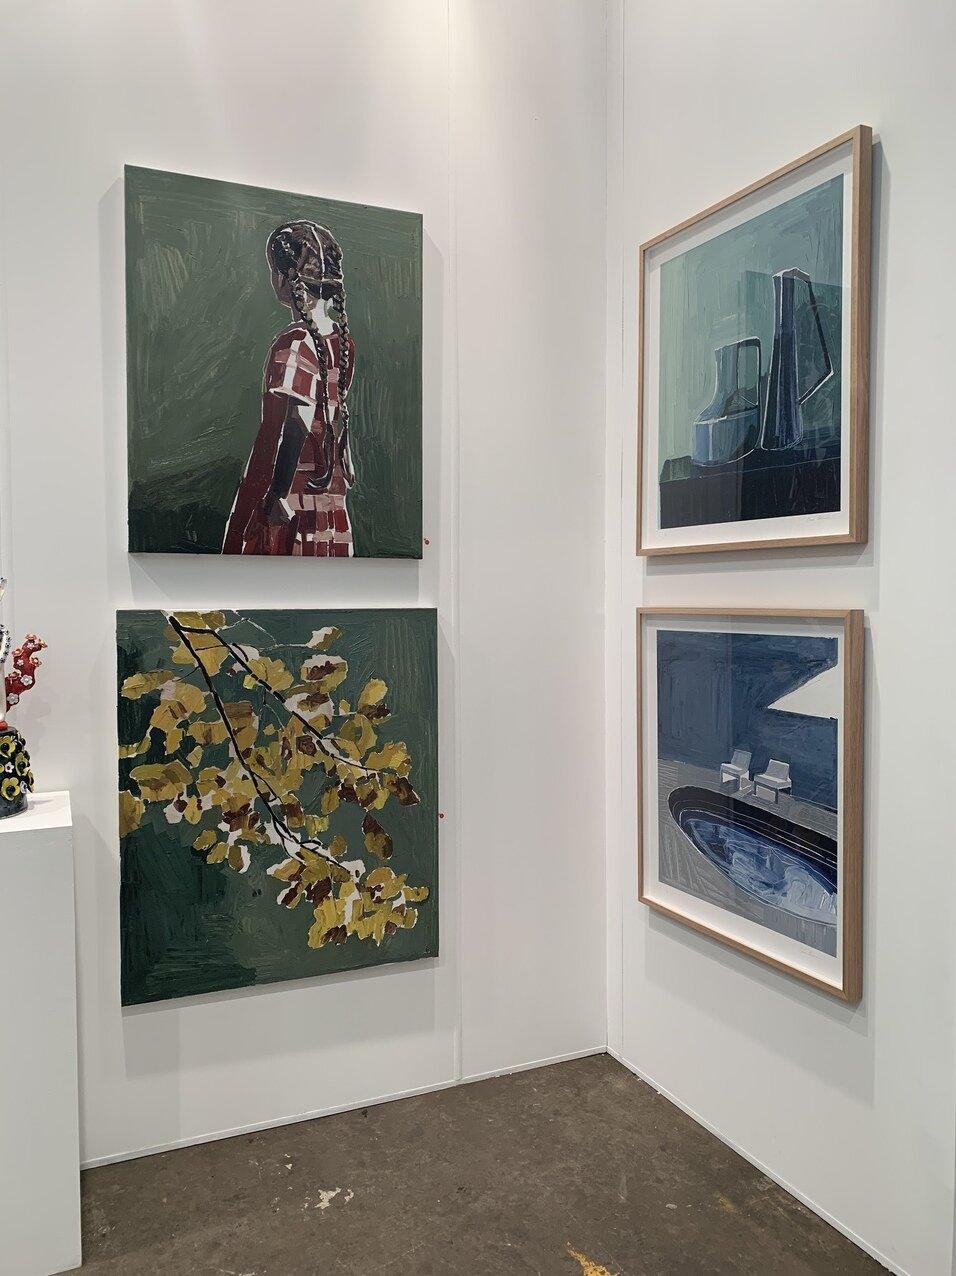 Clara Adolphs, Edwina Corlette Gallery